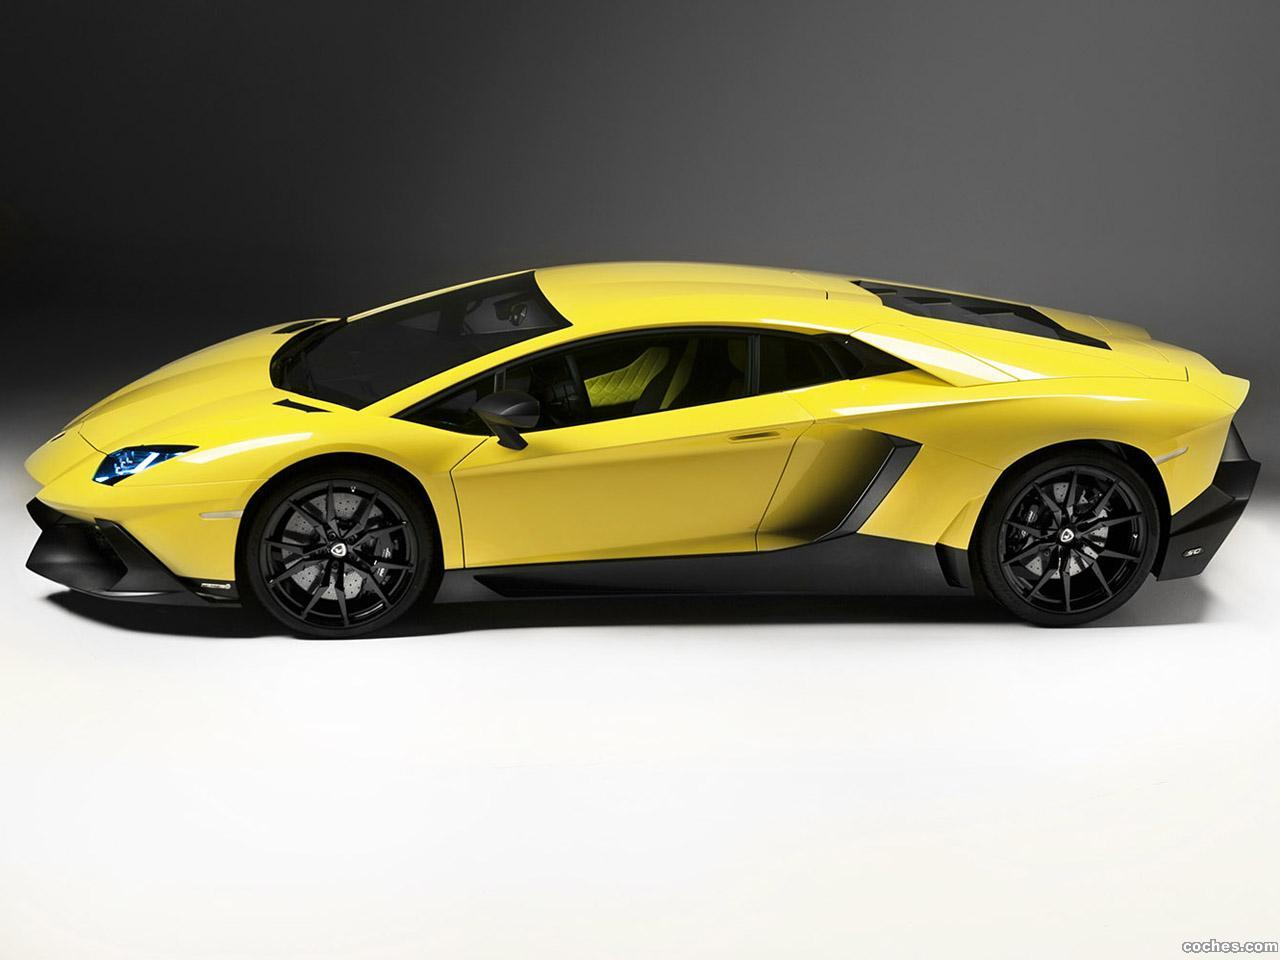 Foto 2 de Lamborghini Aventador LP720-4 50 Anniversario Edition 2013